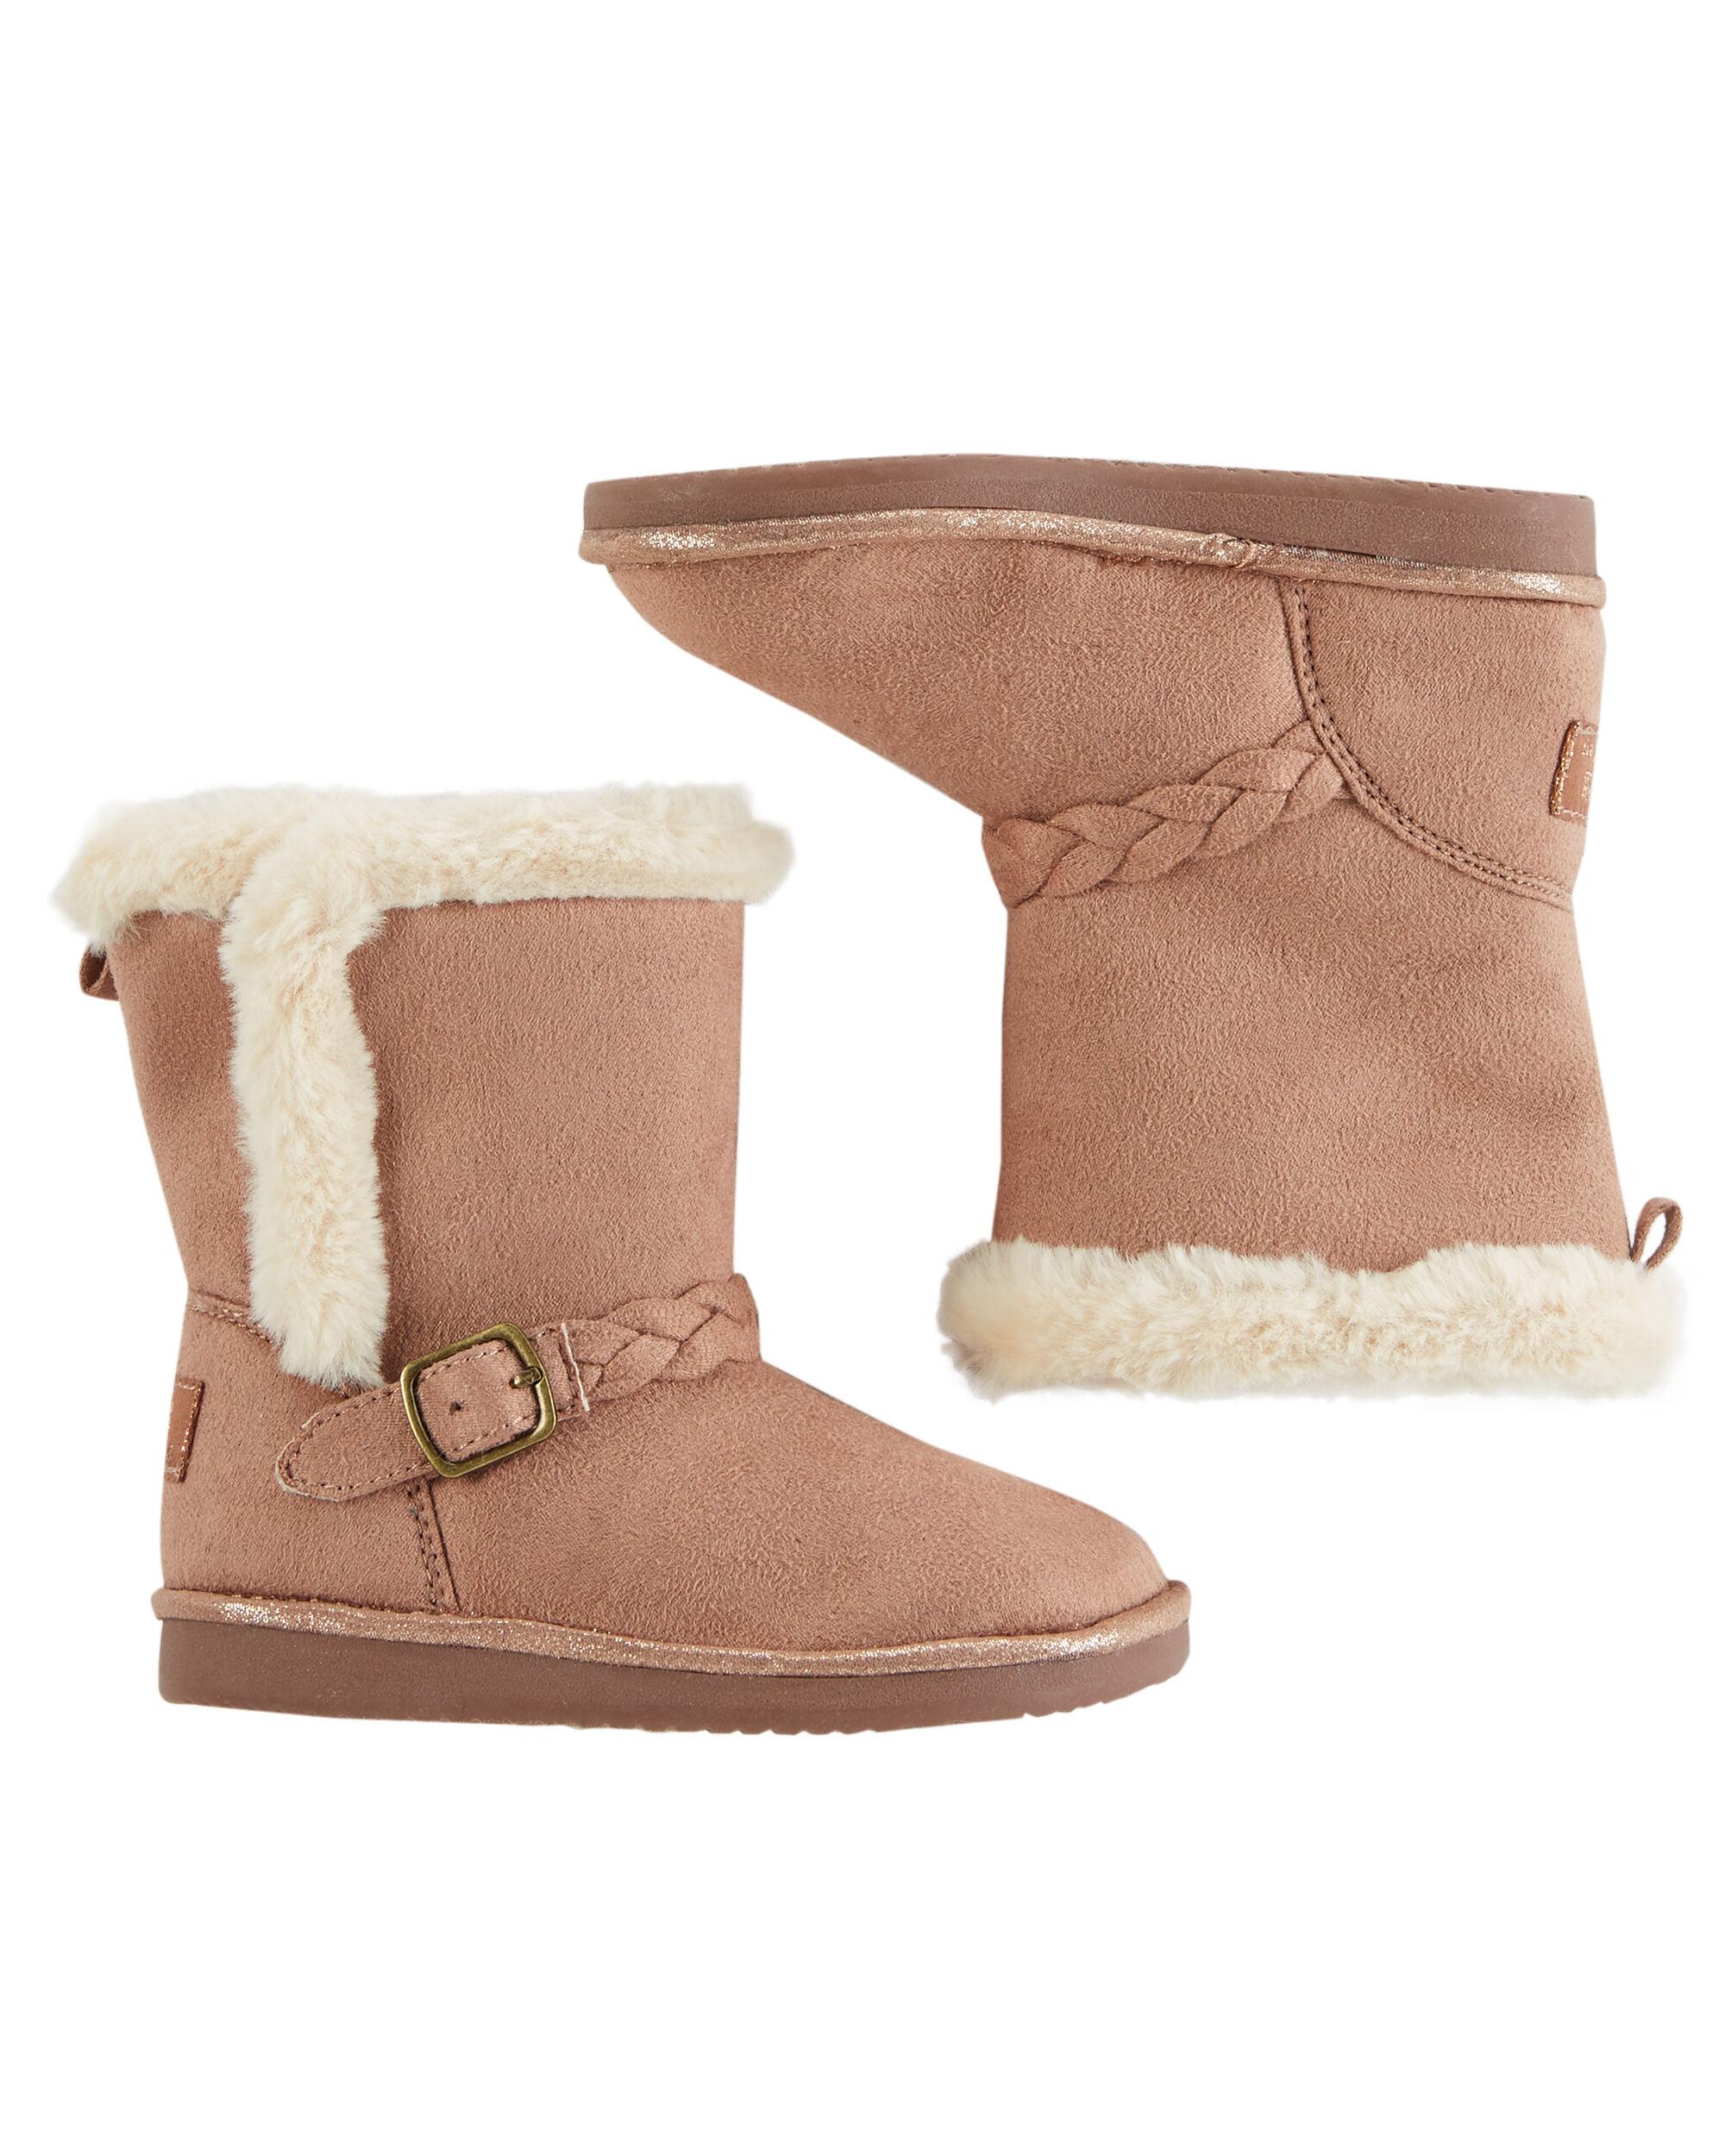 OshKosh Sherpa Boots   oshkosh.com